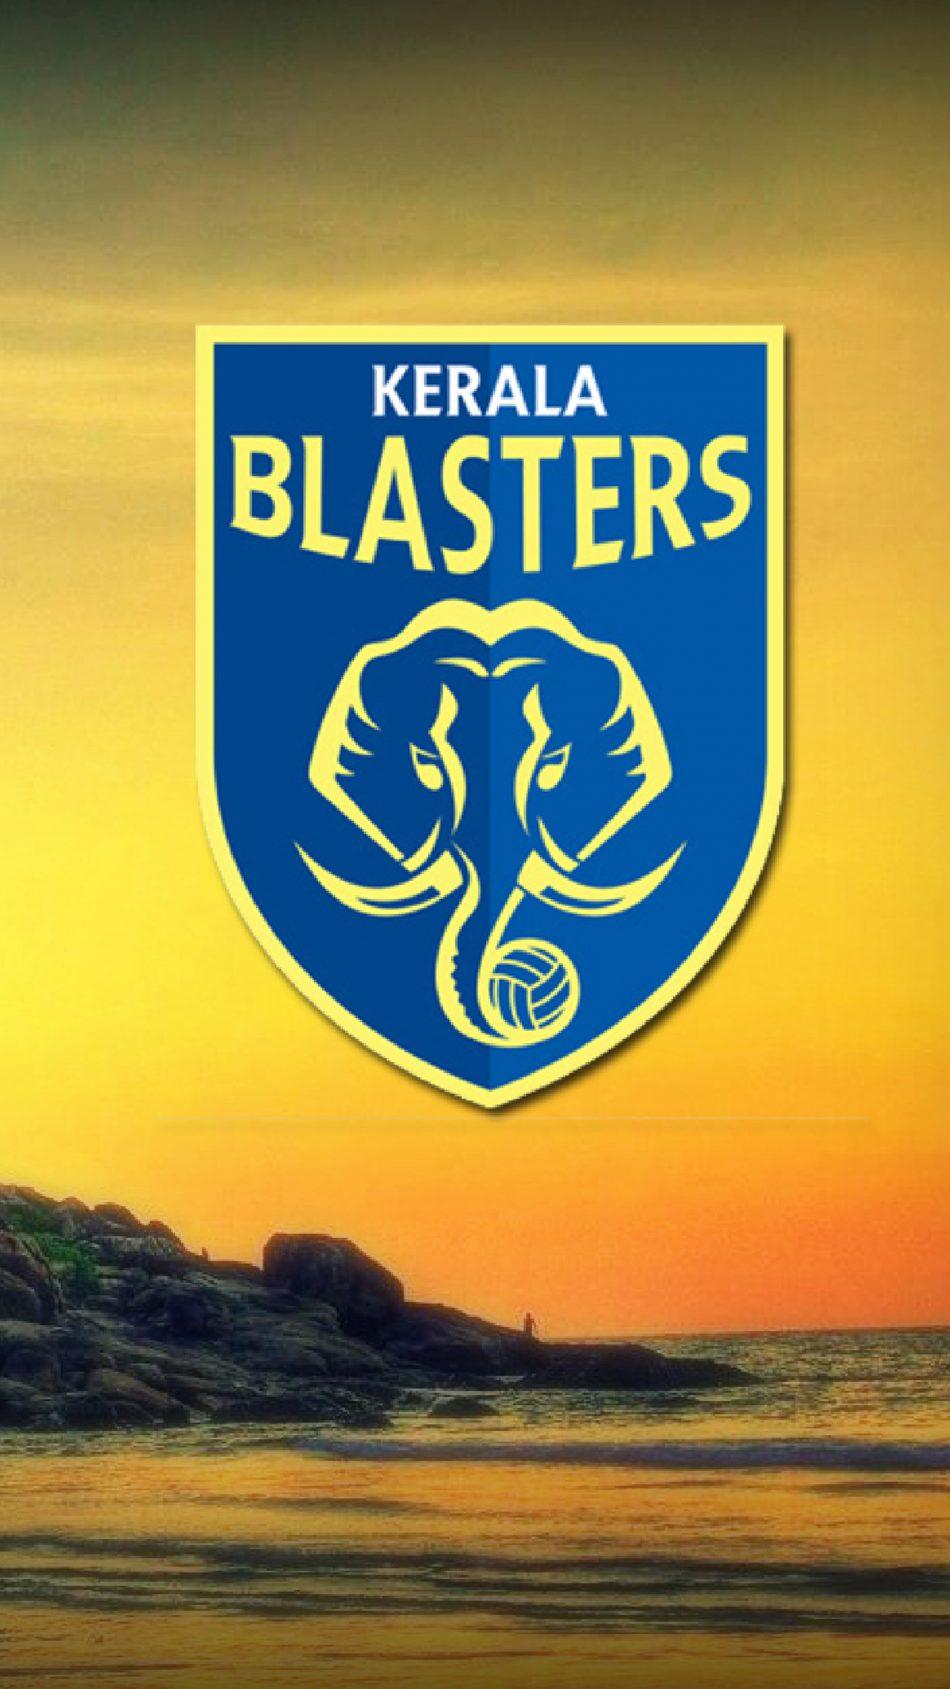 Kerala Blasters   Download HD Mobile Wallpapers 950x1689